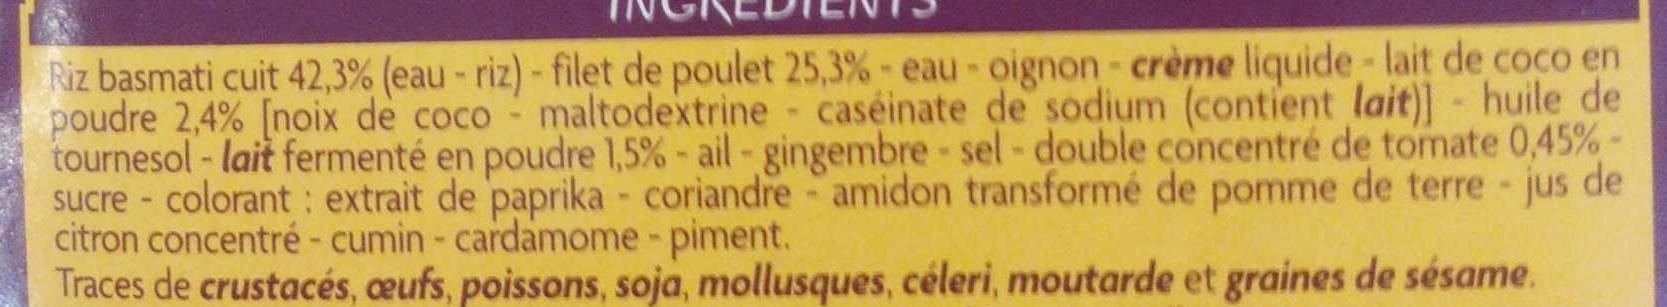 Poulet tikka massala et riz basmati - Ingrediënten - fr